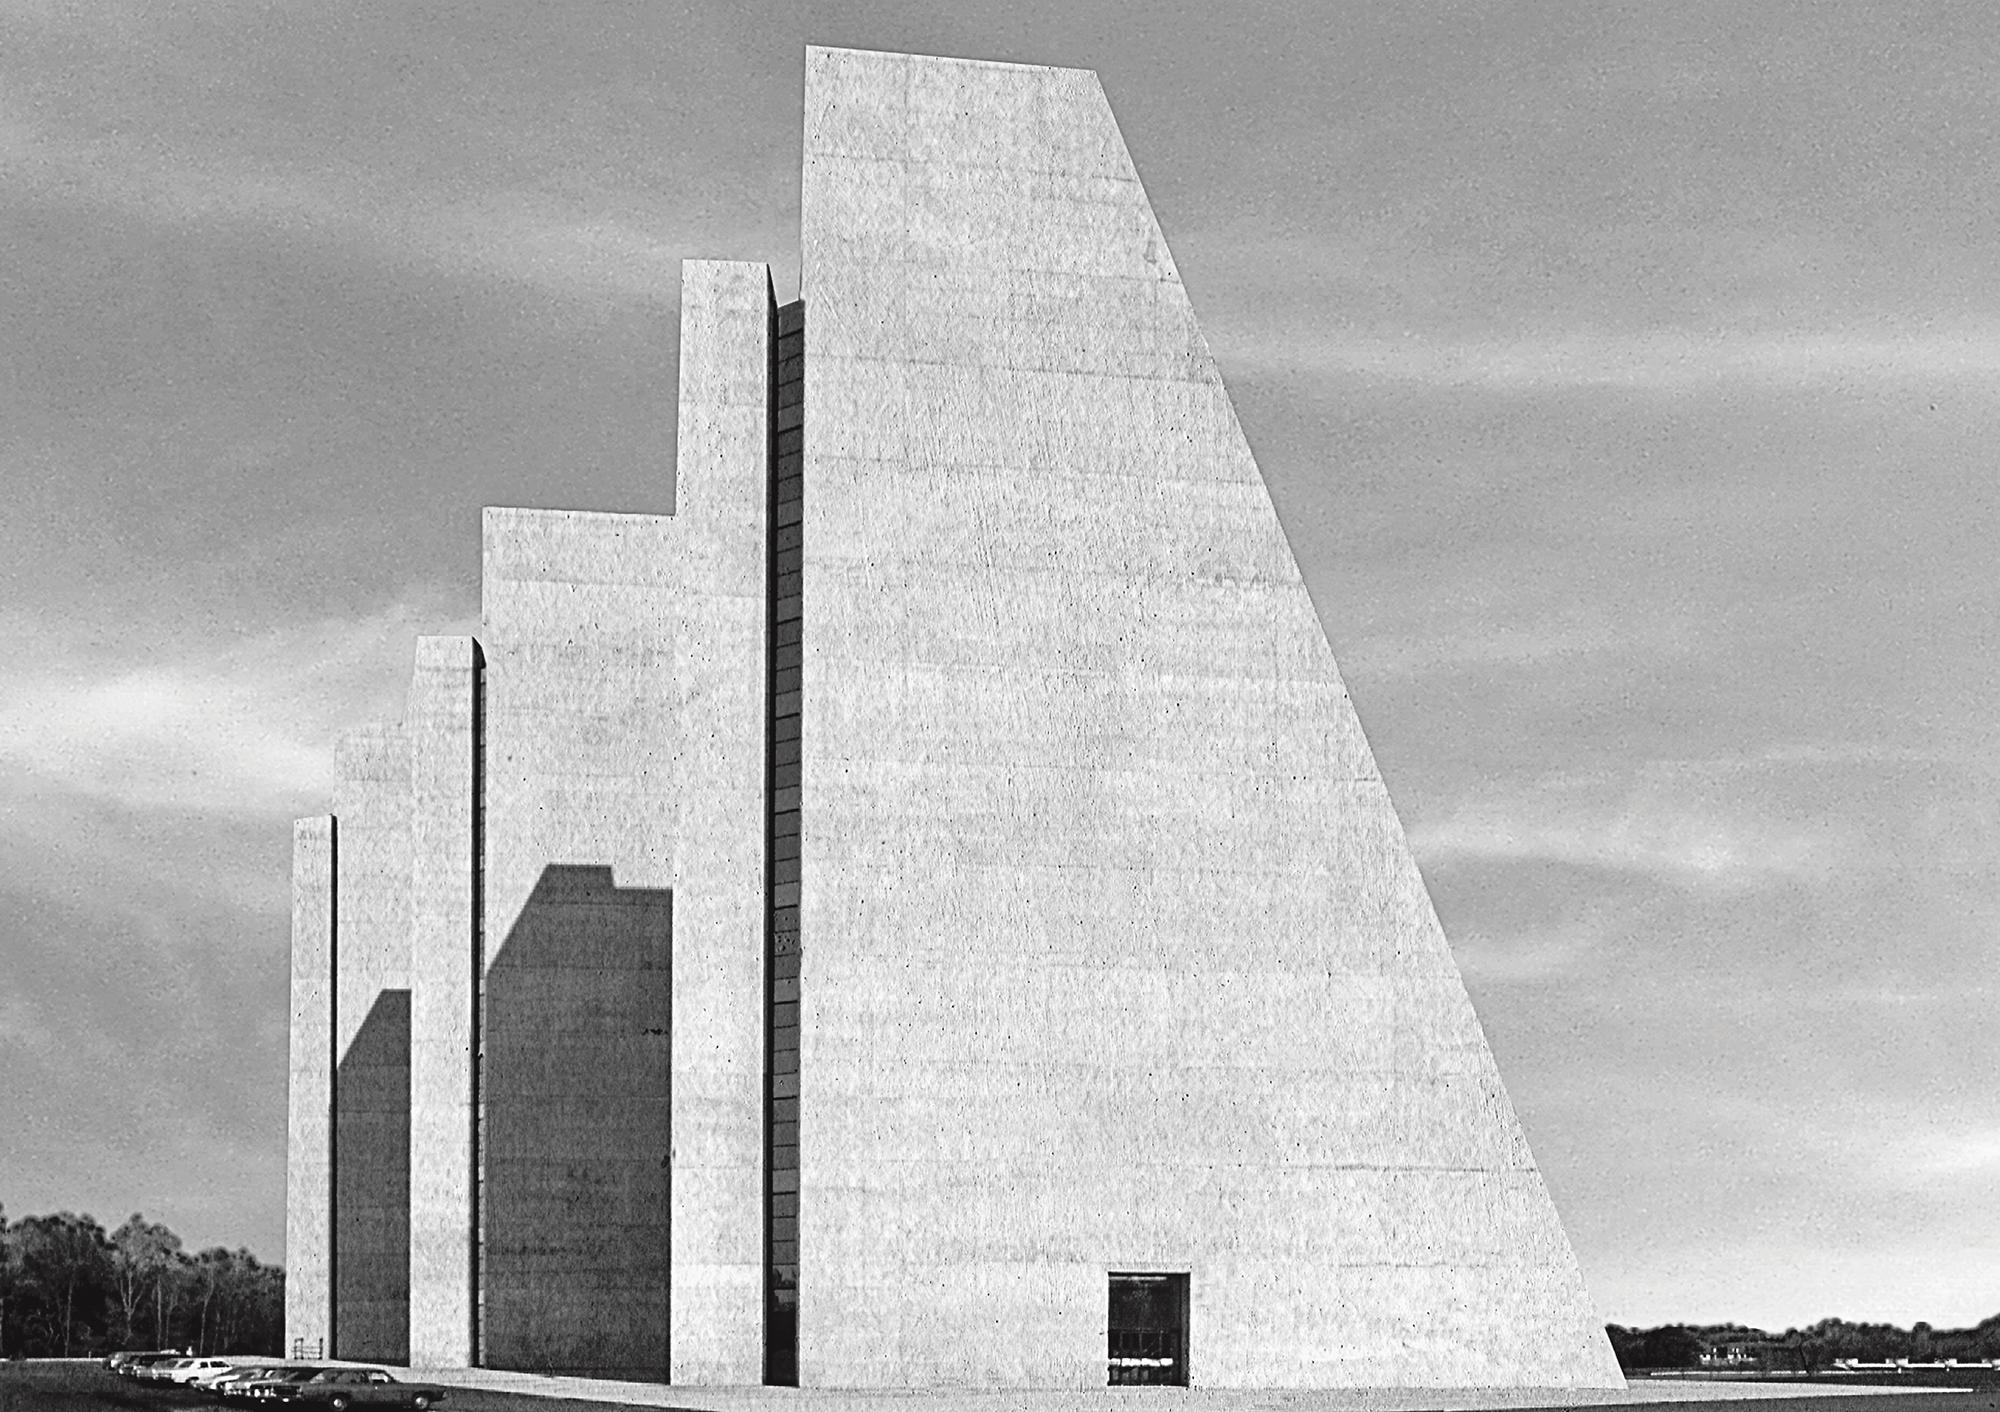 College Life Insurance Company of America headquarters, Atlas of Brutalist Architecture